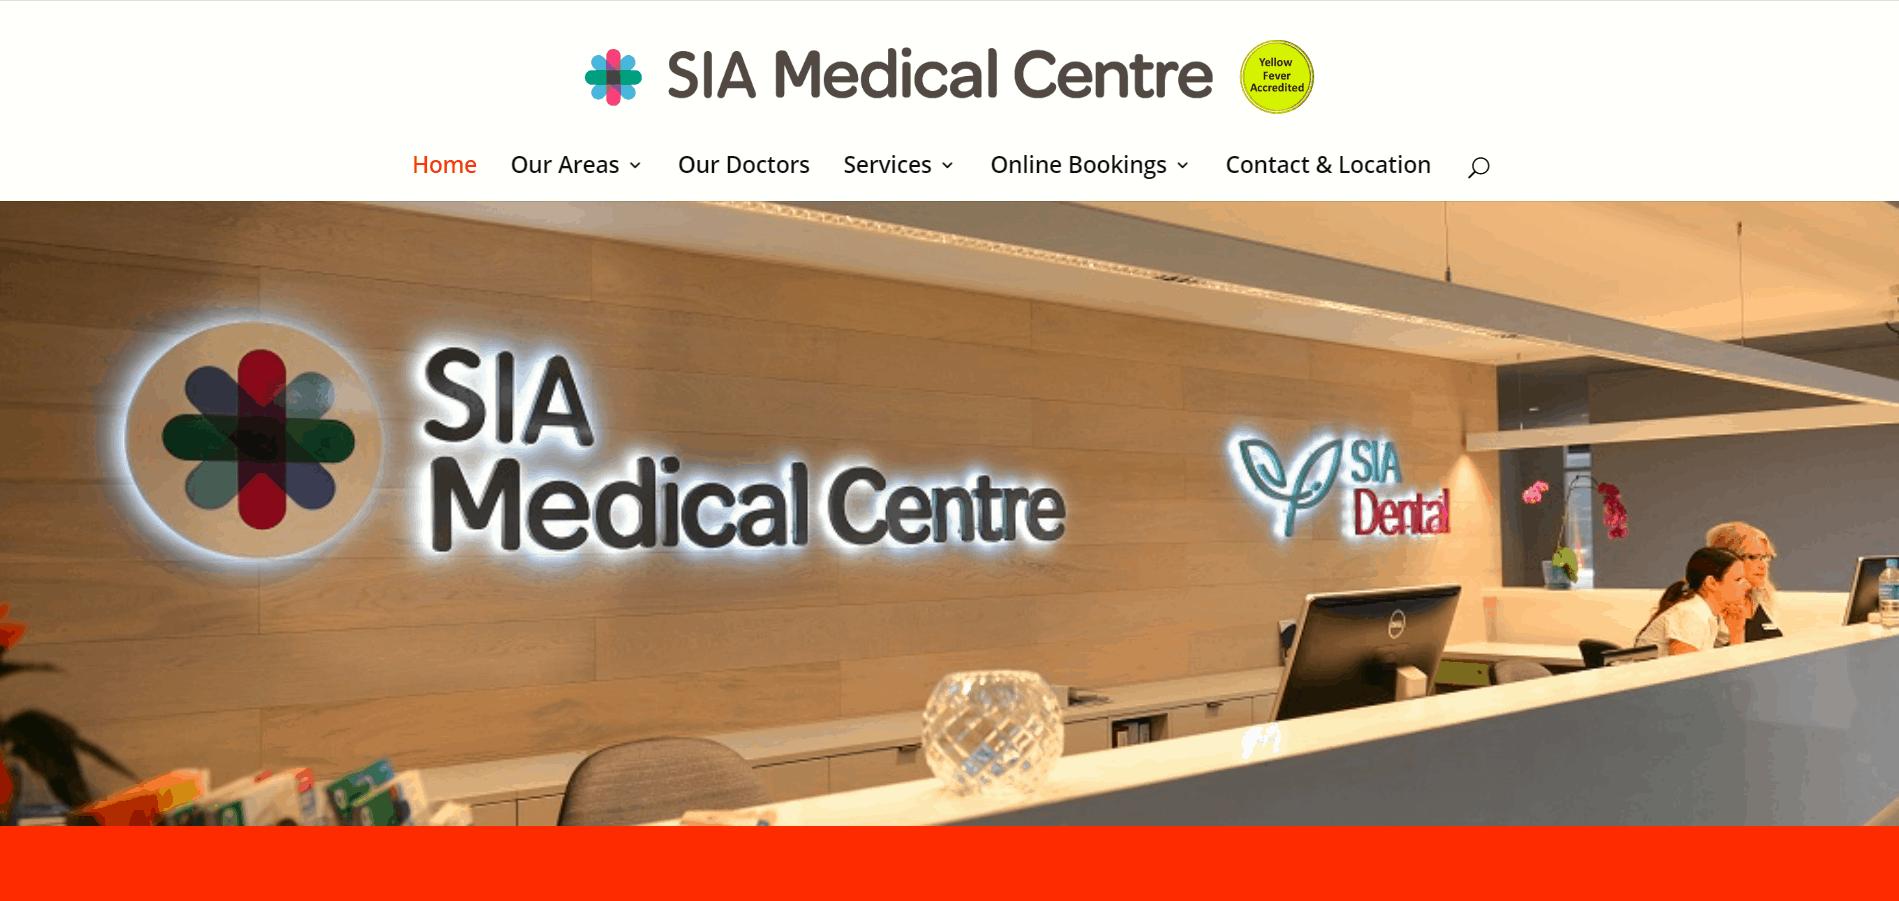 Sia Medical Centre